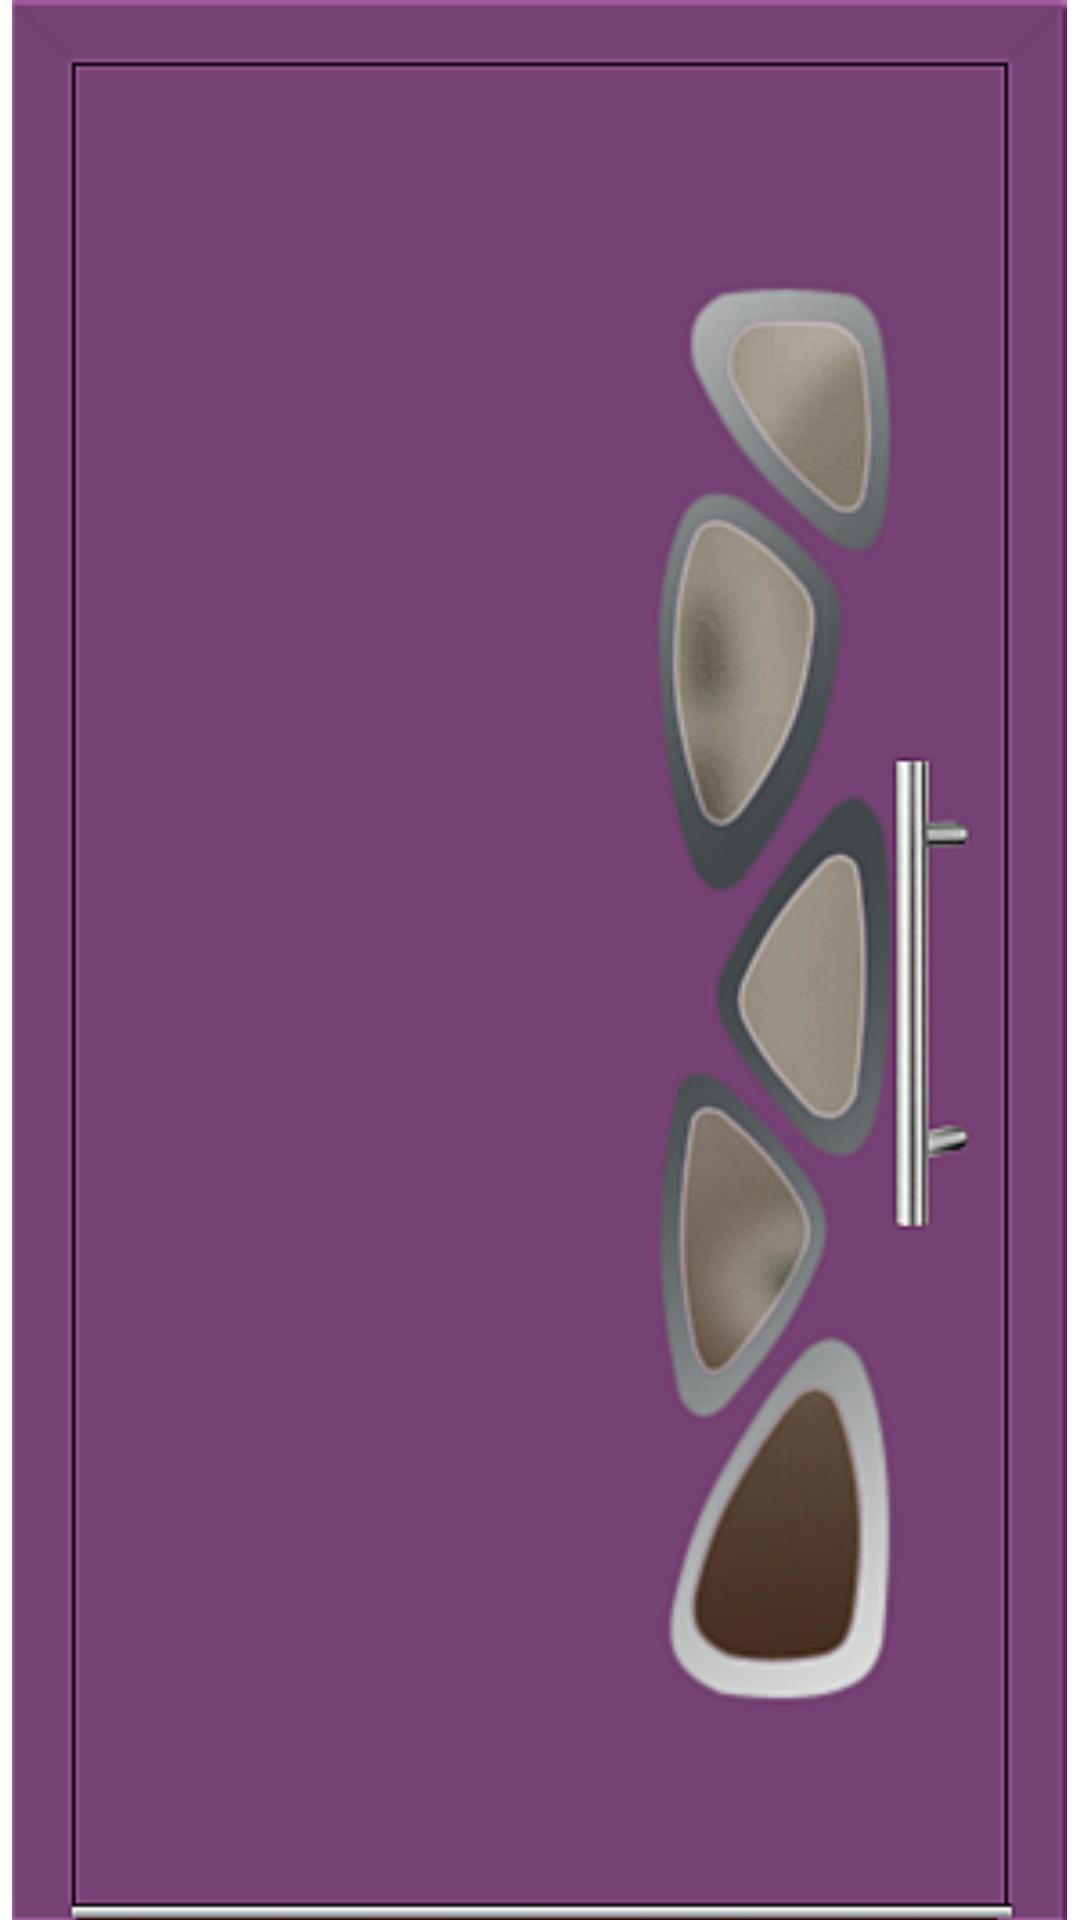 Aluminium Haustür Modell 6155-40 singalviolett